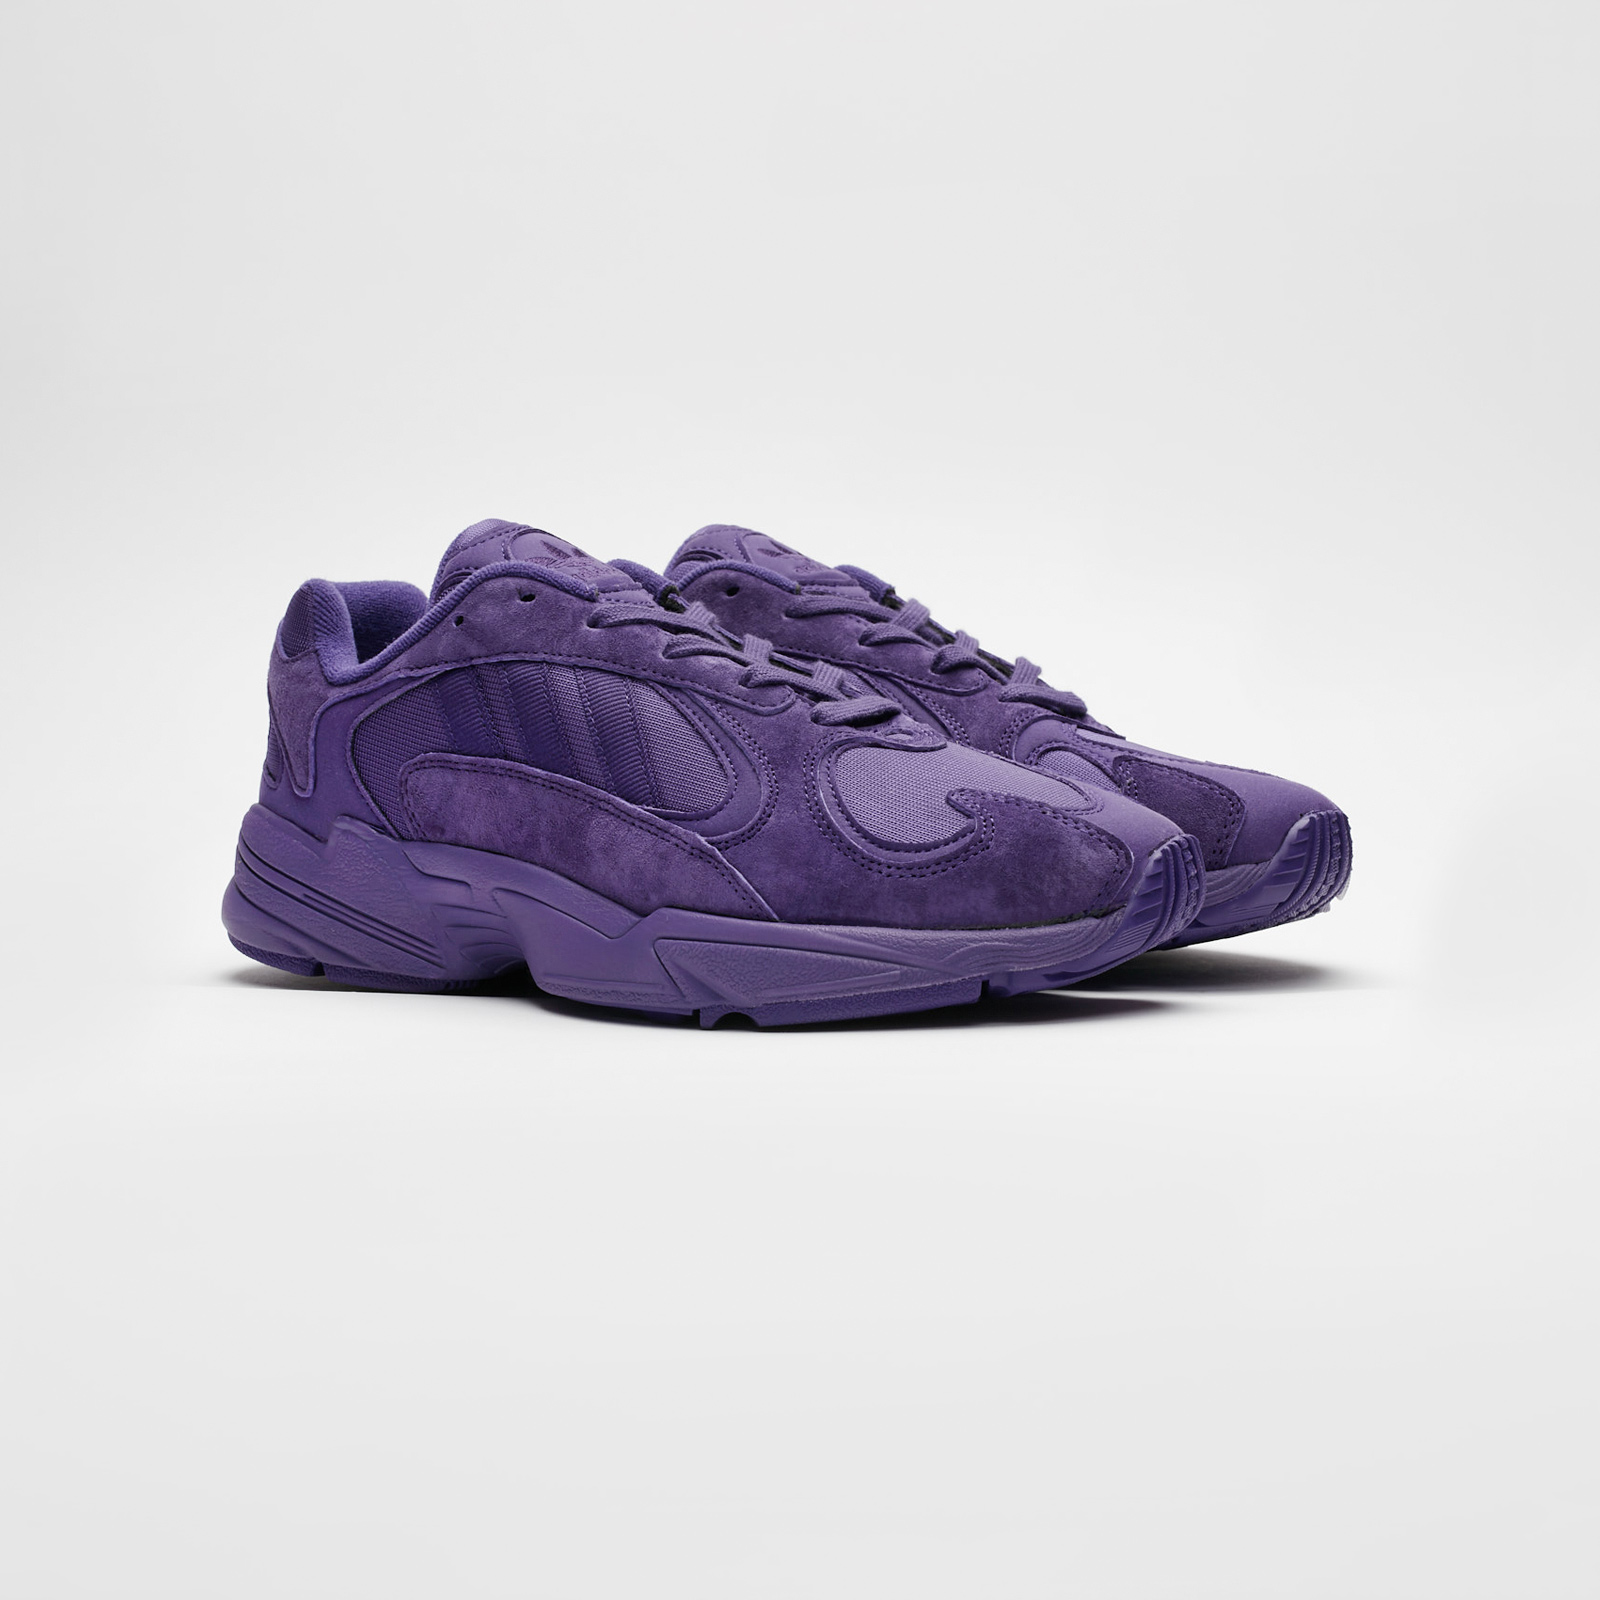 adidas yung 1 femme violet